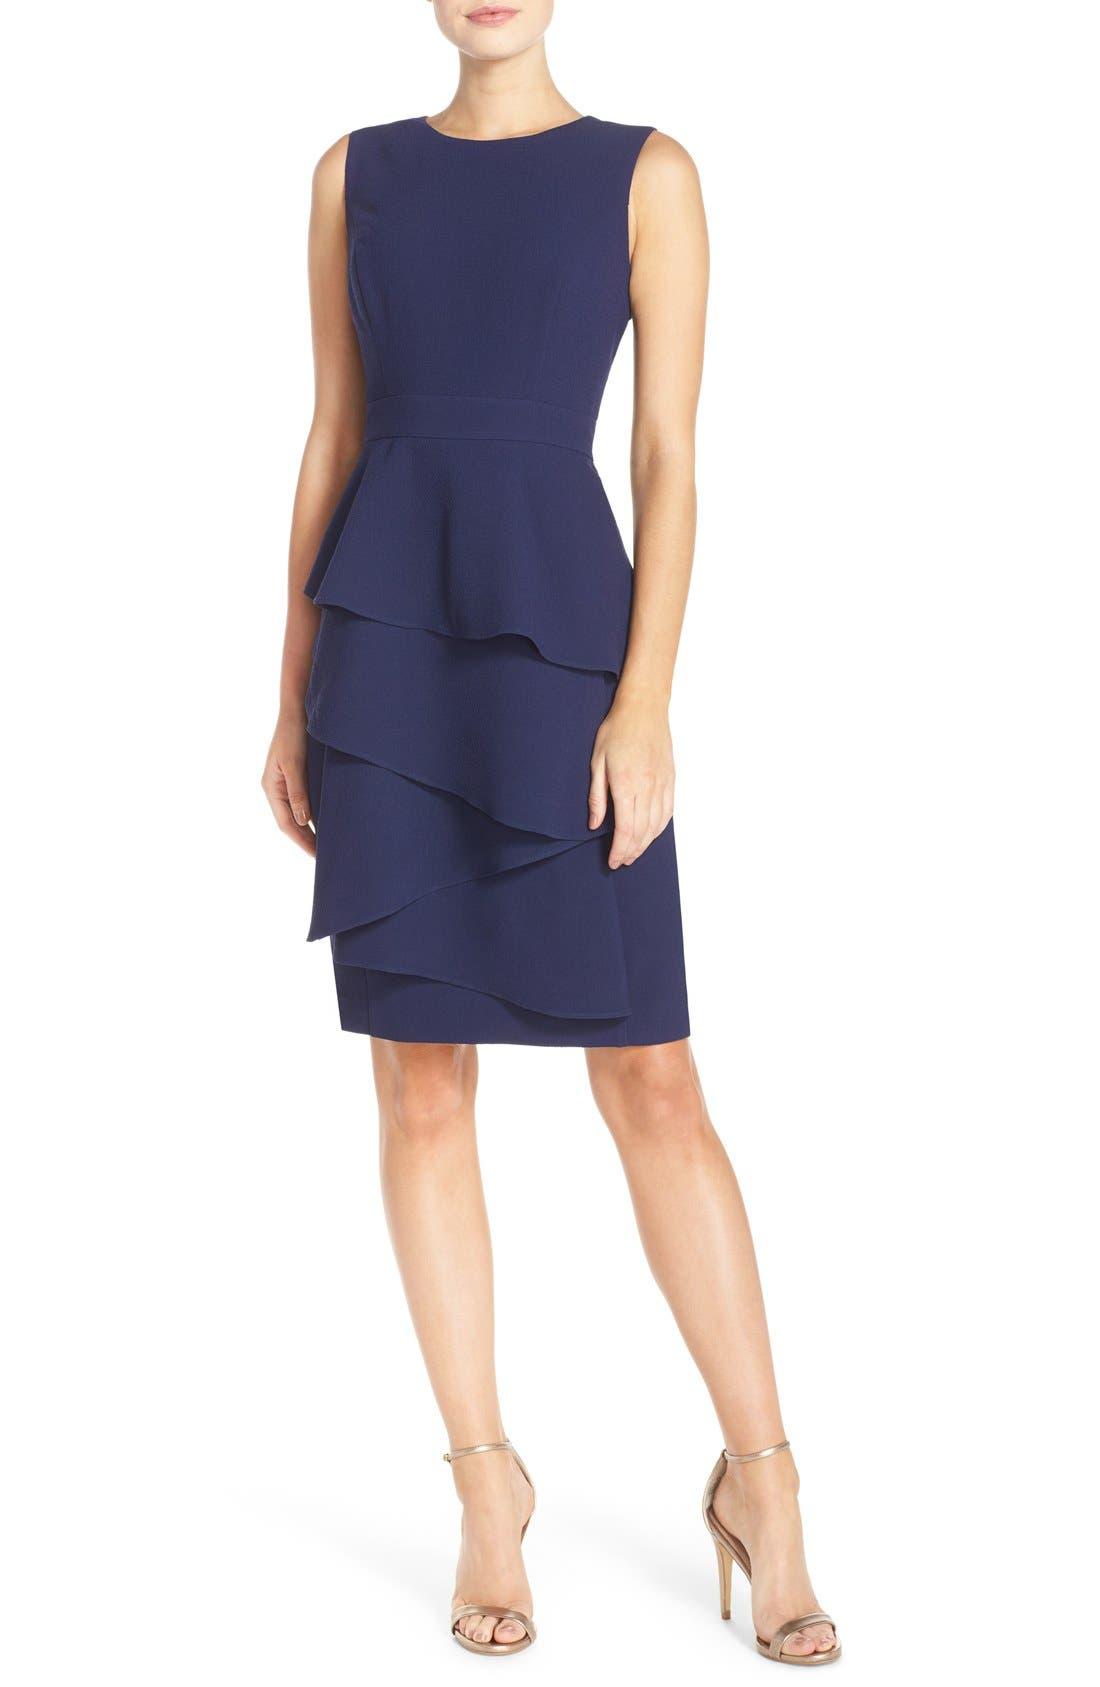 Alternate Image 1 Selected - Eliza J Ella Cascade Crepe Sheath Dress (Regular & Petite)